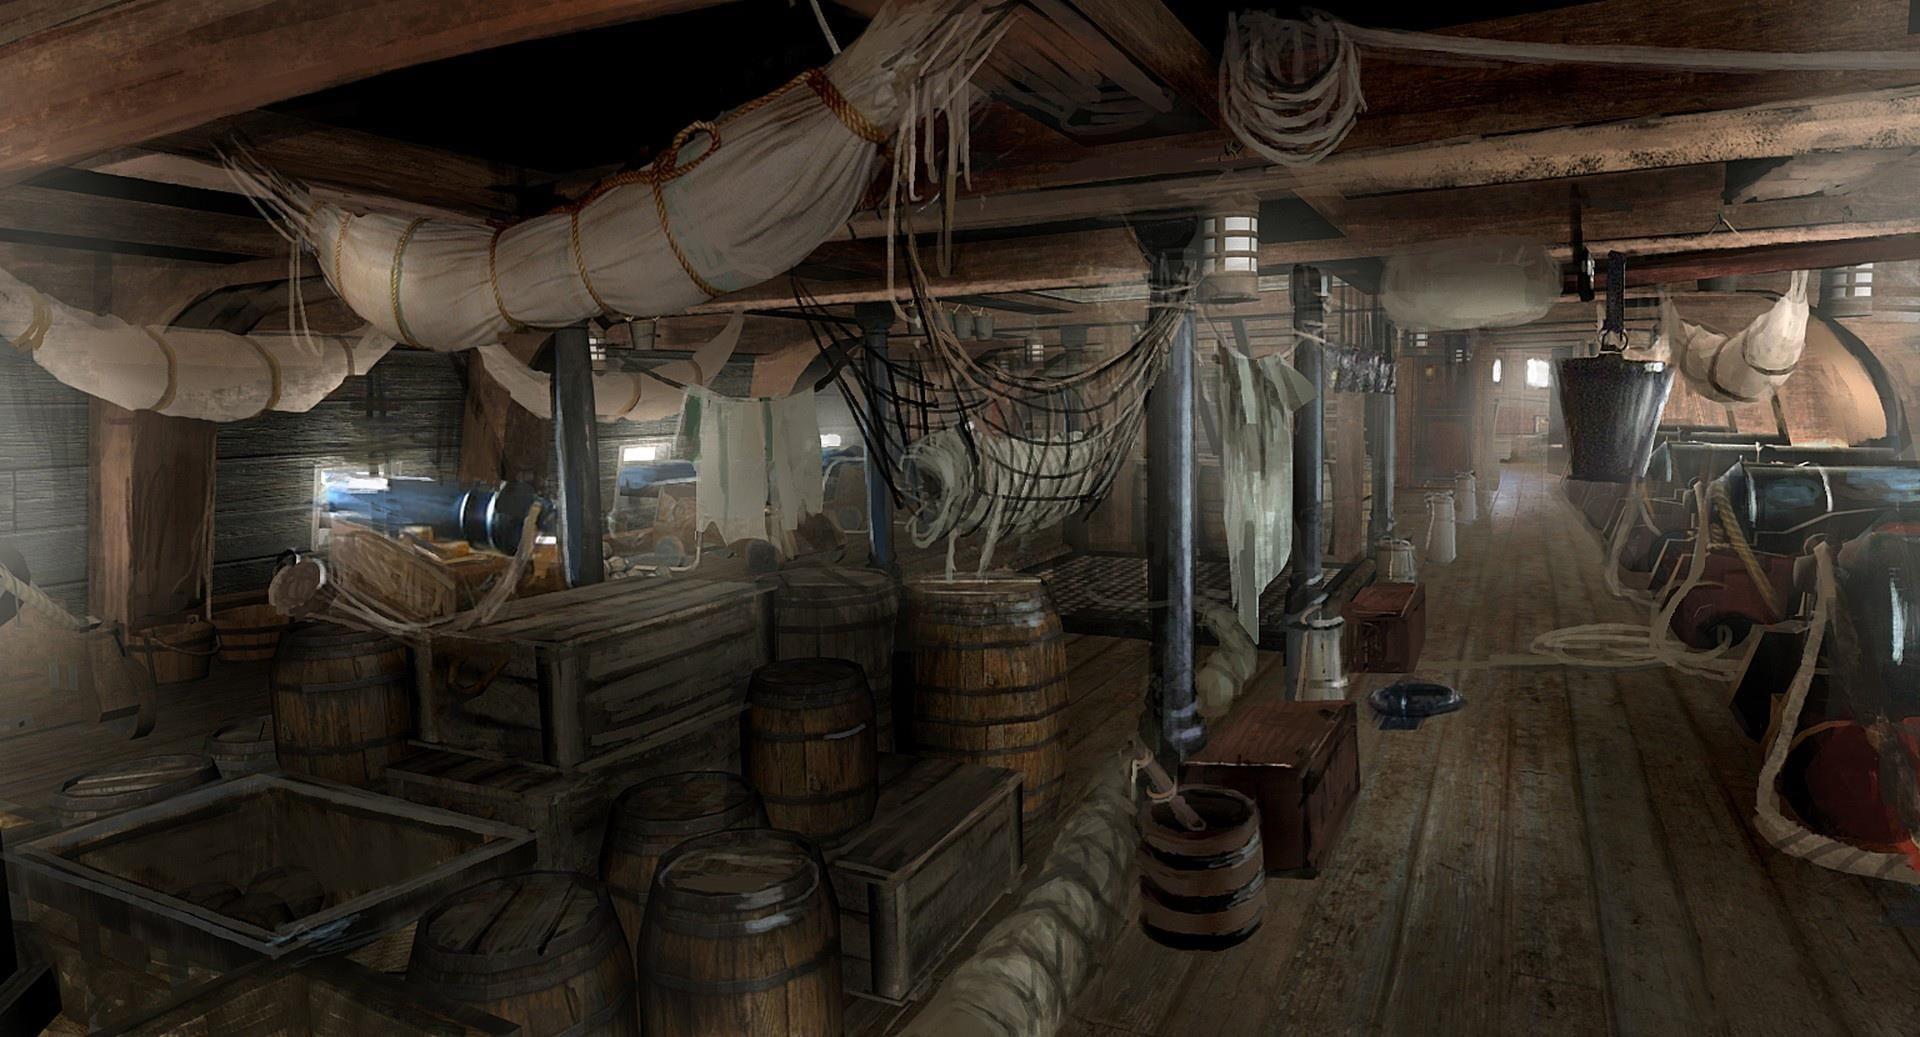 картинки трюма корабля расположен тихом месте